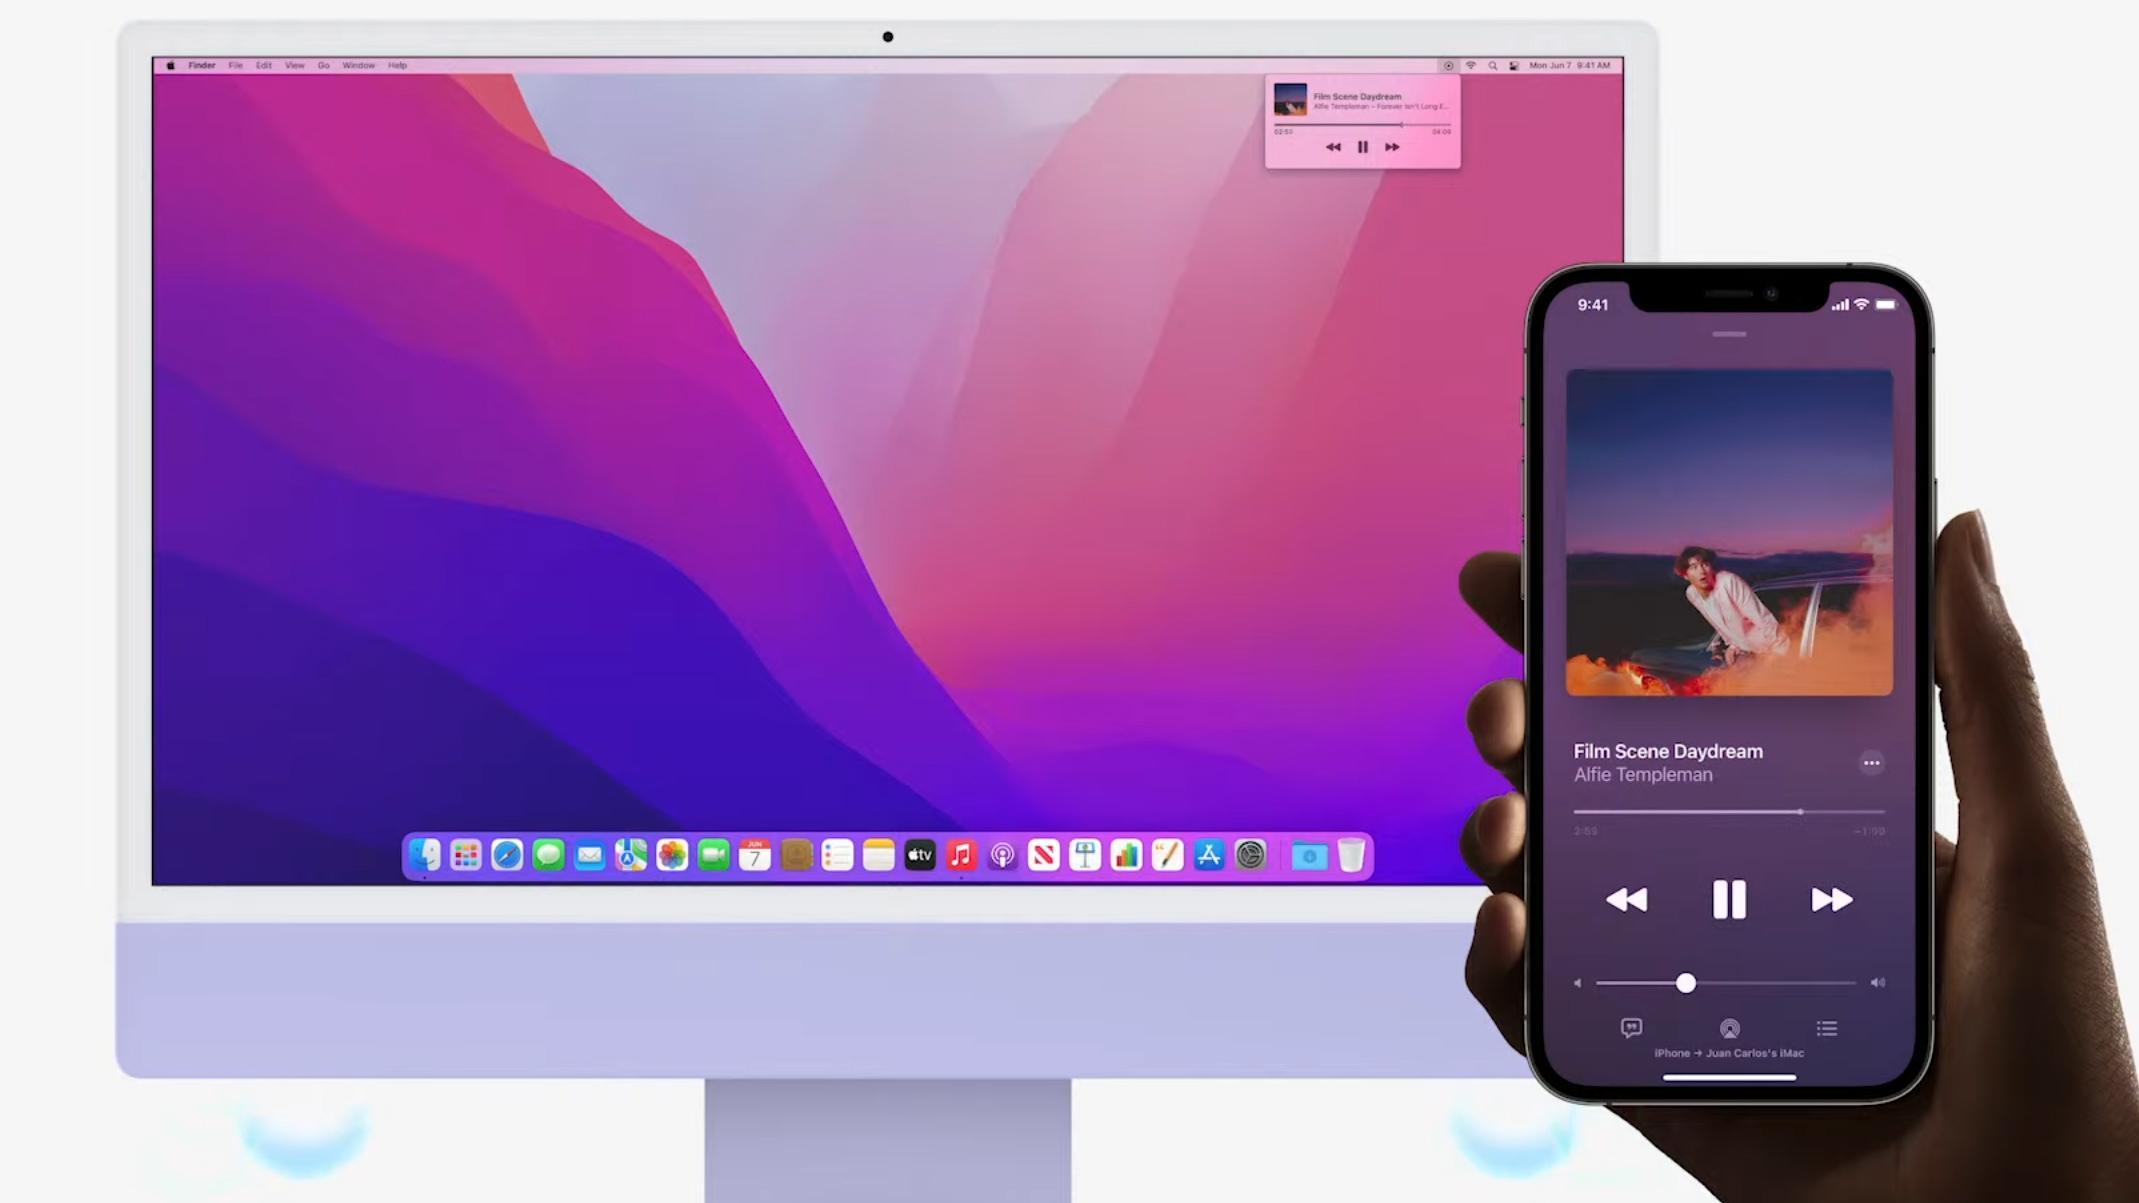 AirPlay kommer til MacOS. Send lyd til datamaskinen fra iPhone eller iPad.